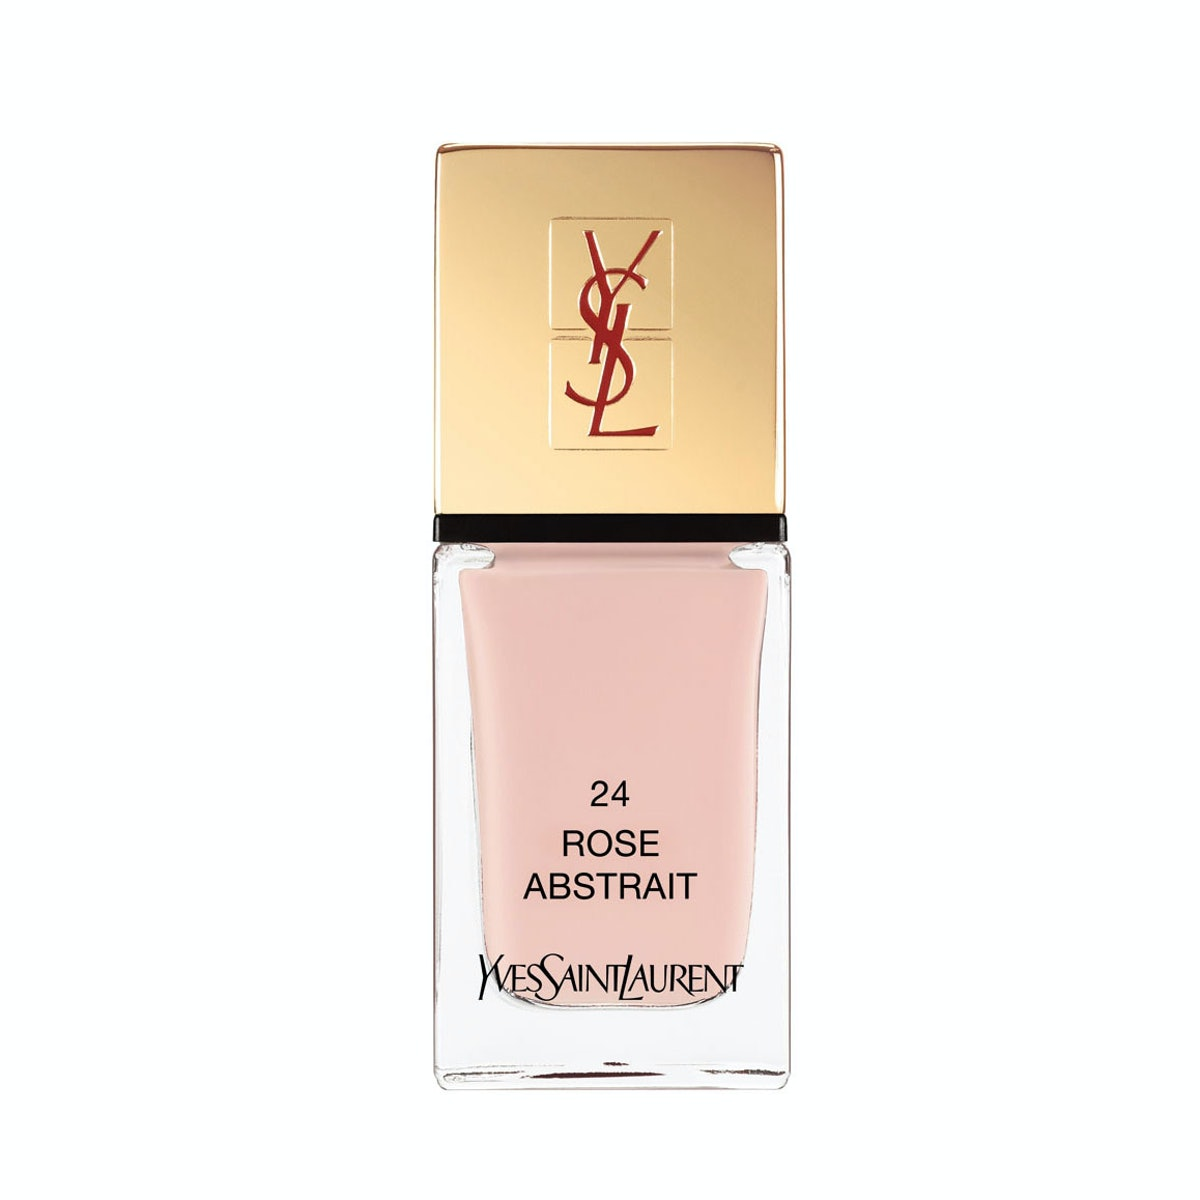 YSL La Laque Couture polish in No. 24 Rose Abstrait